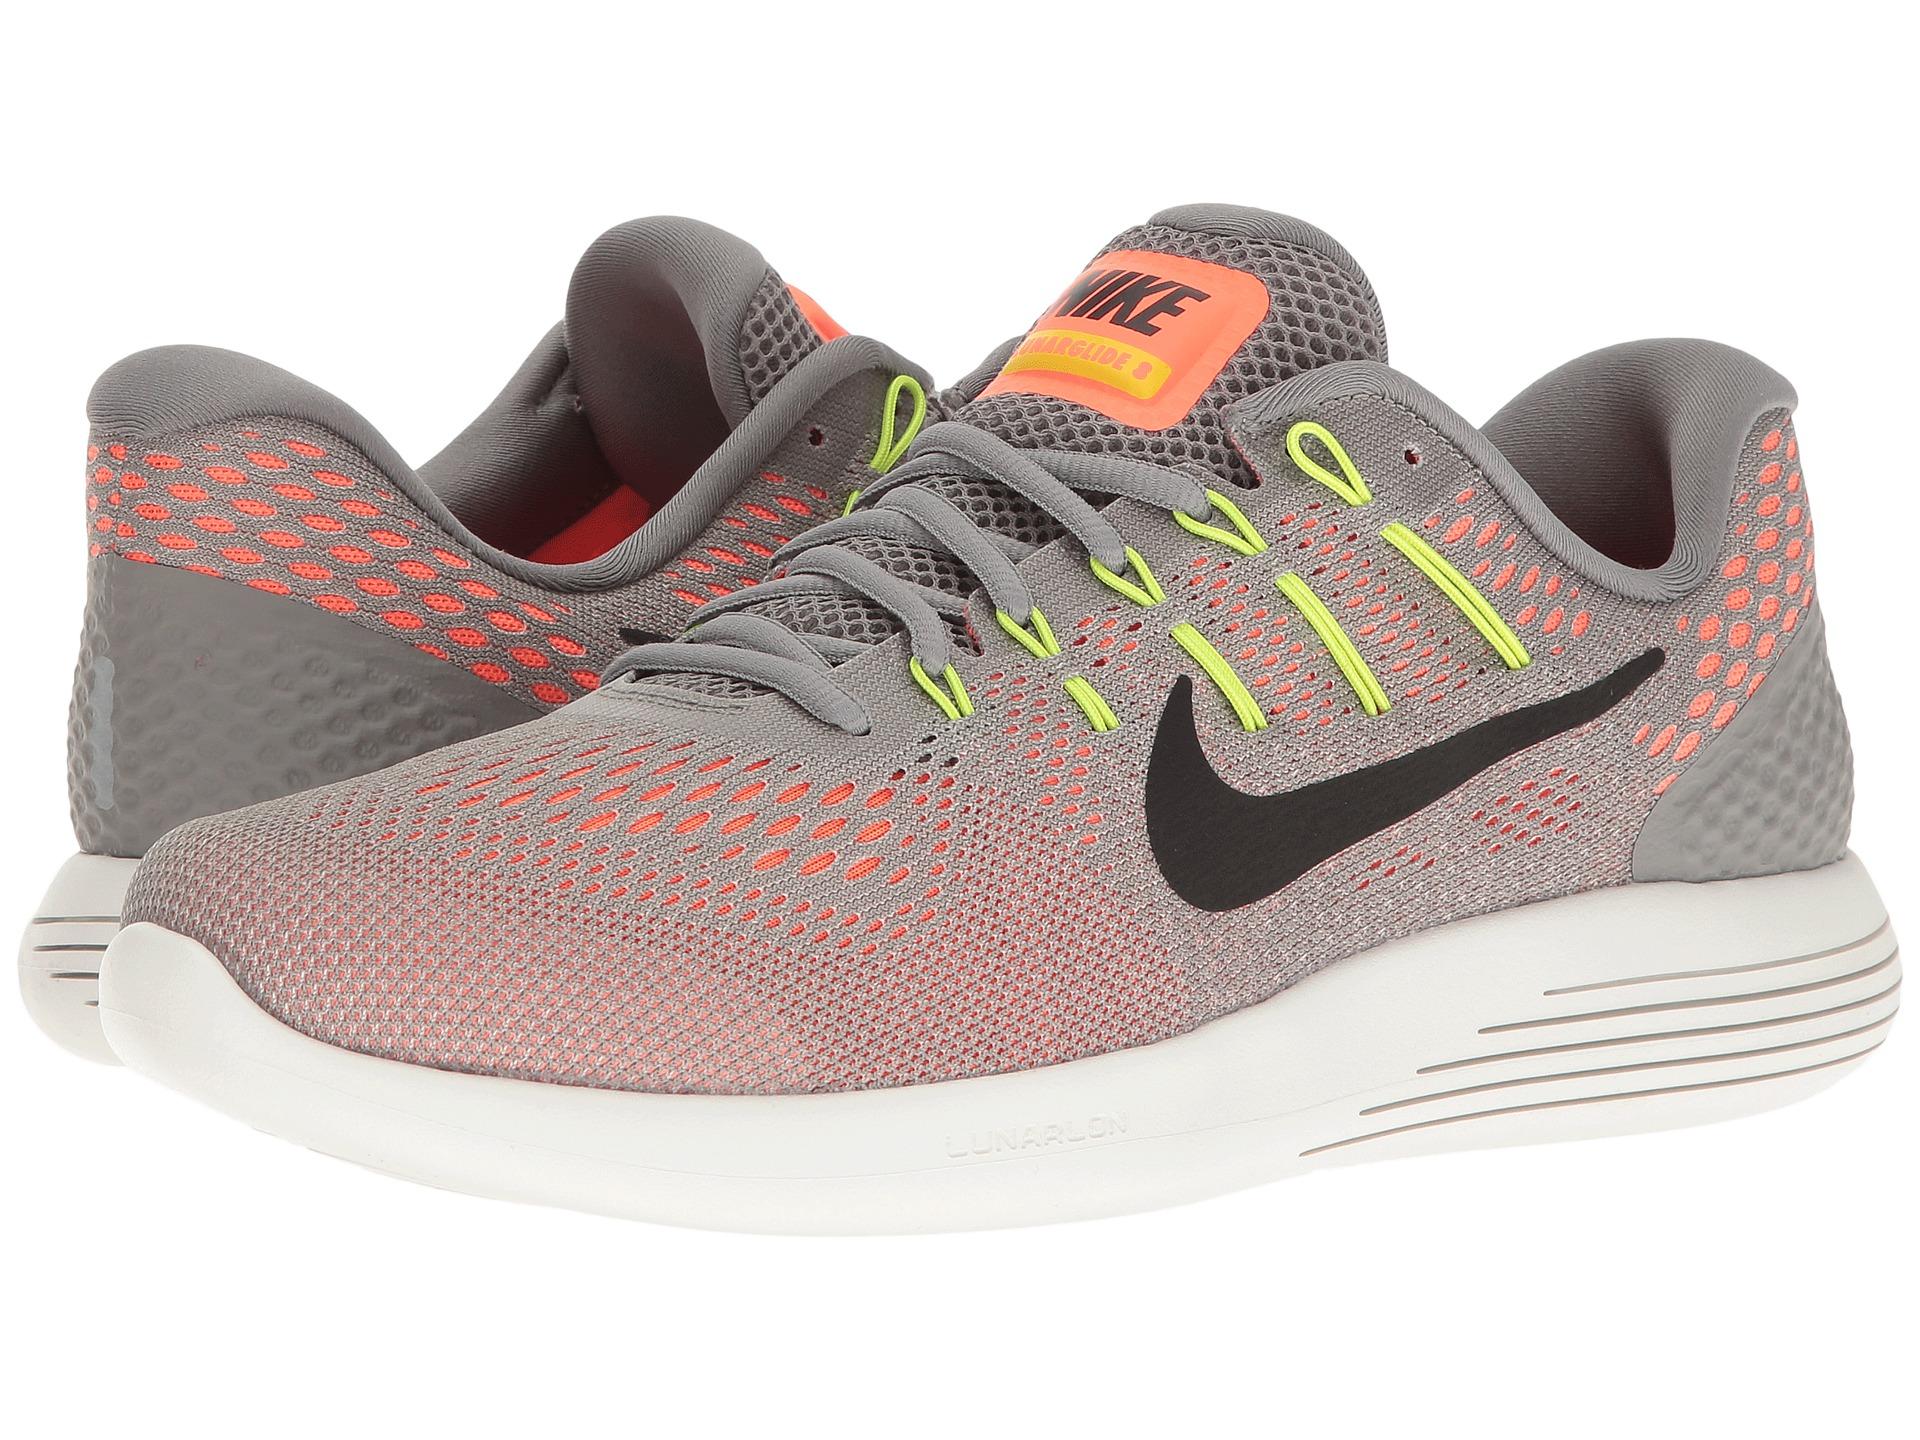 new product 50f19 461de zappos nike men running shoes